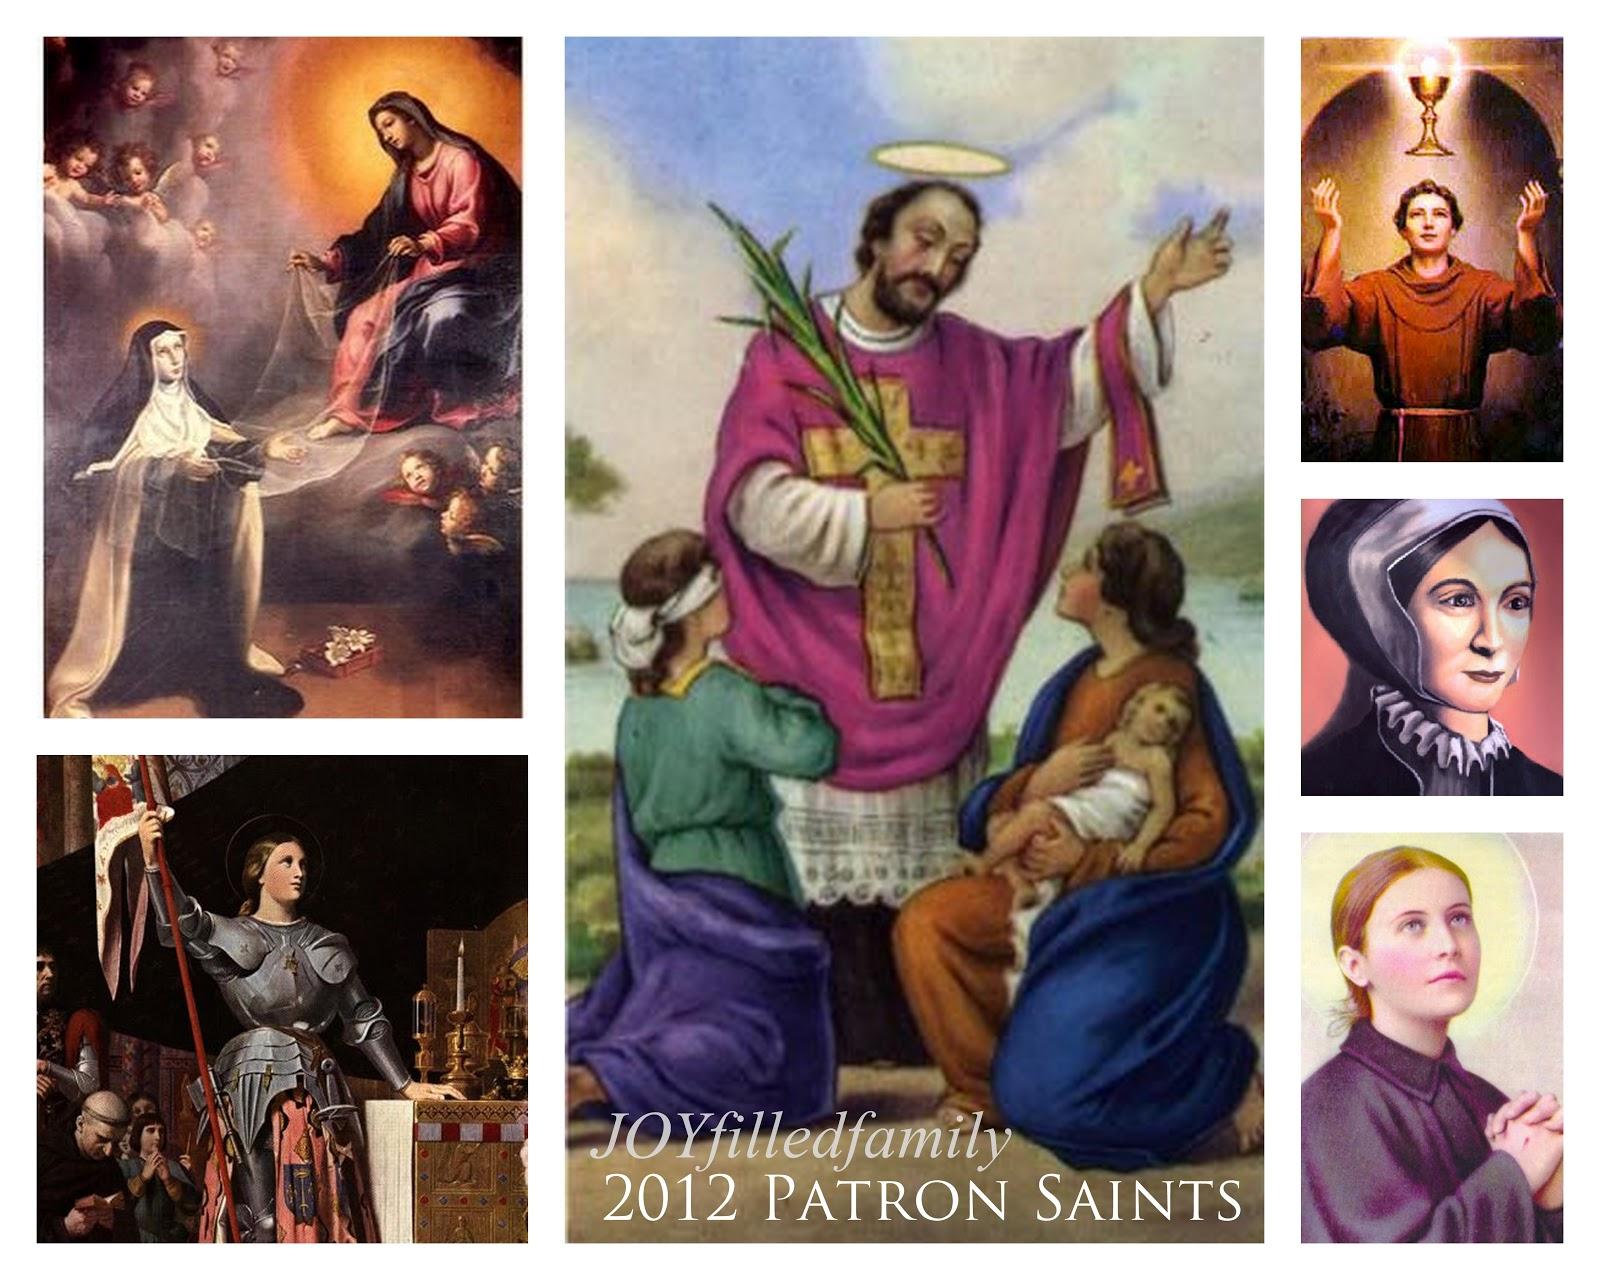 Catholic saints pictures and names family patron saints of 2013